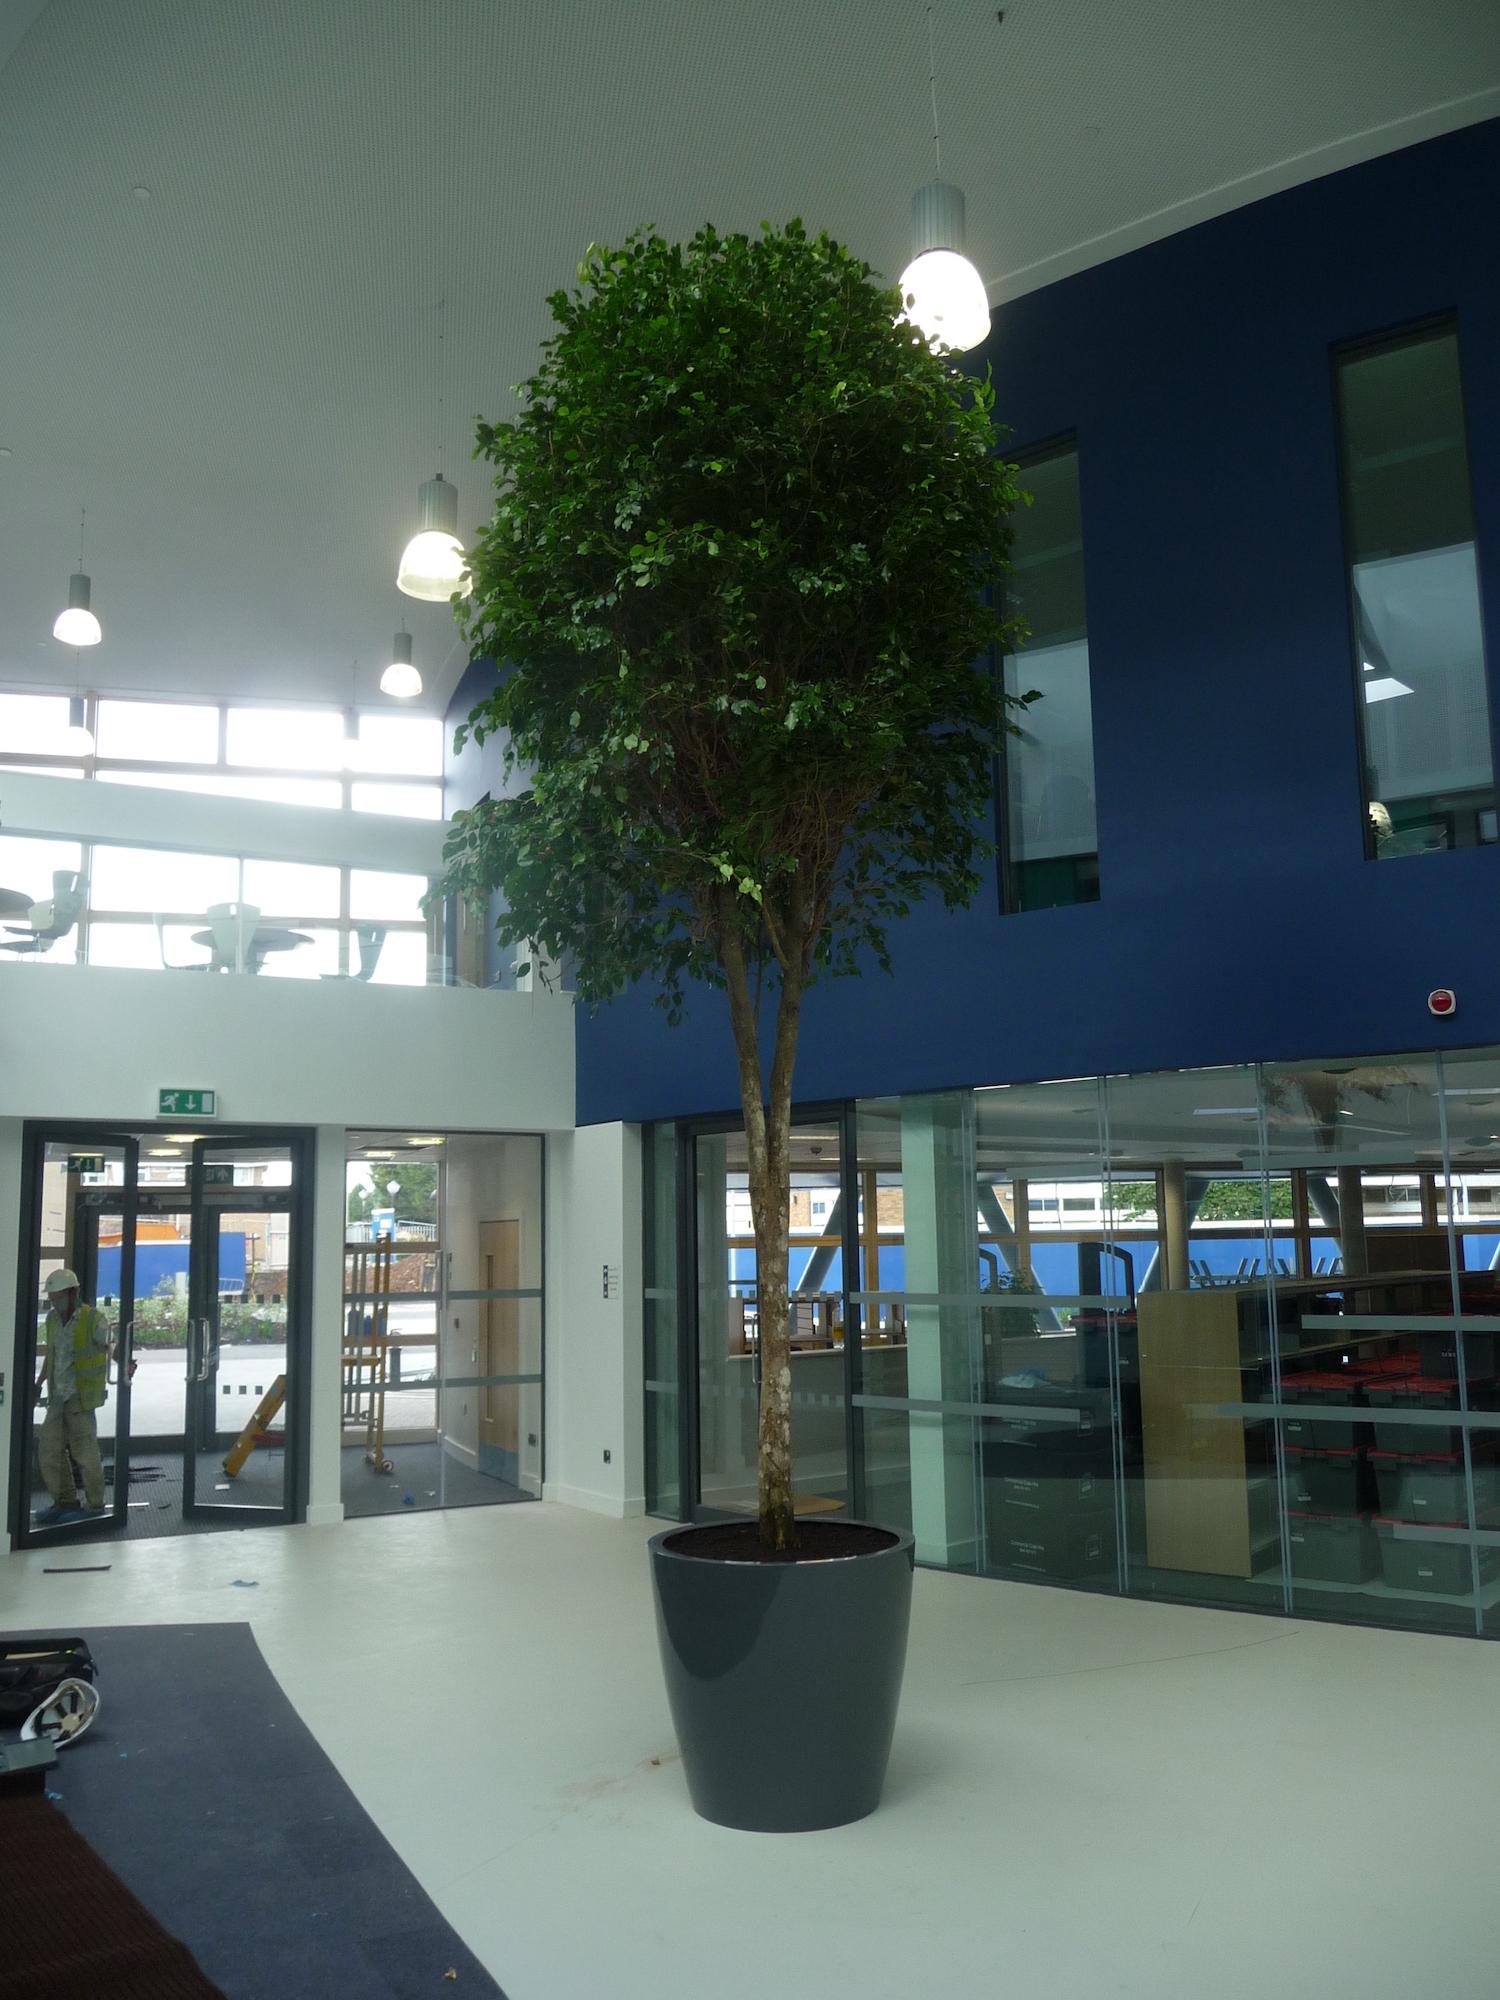 nailsea-school-plantcare-interior-plants-trees-bristol-cardiff-image-1